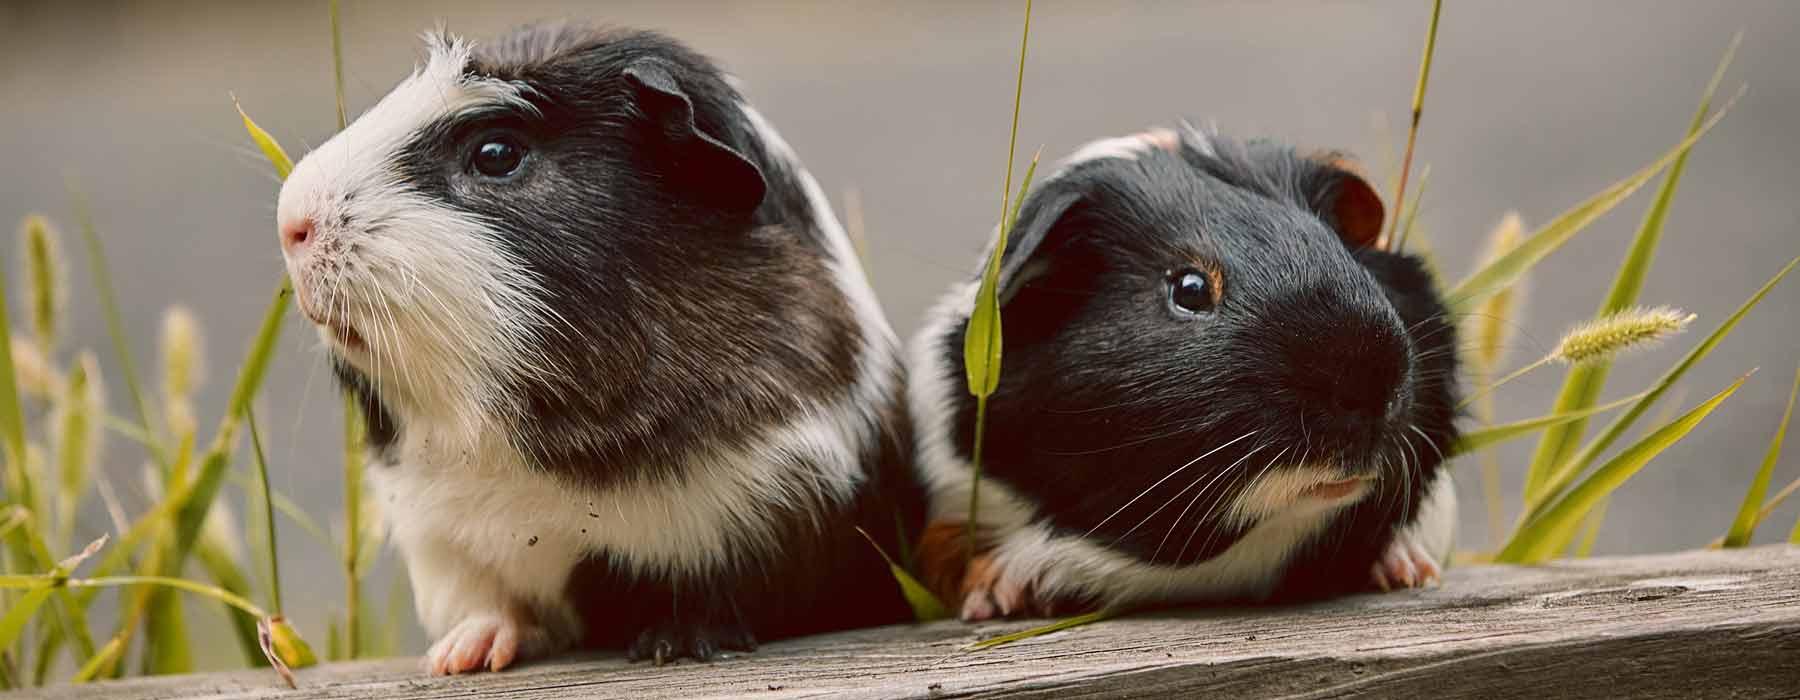 pair of guinea pig friends